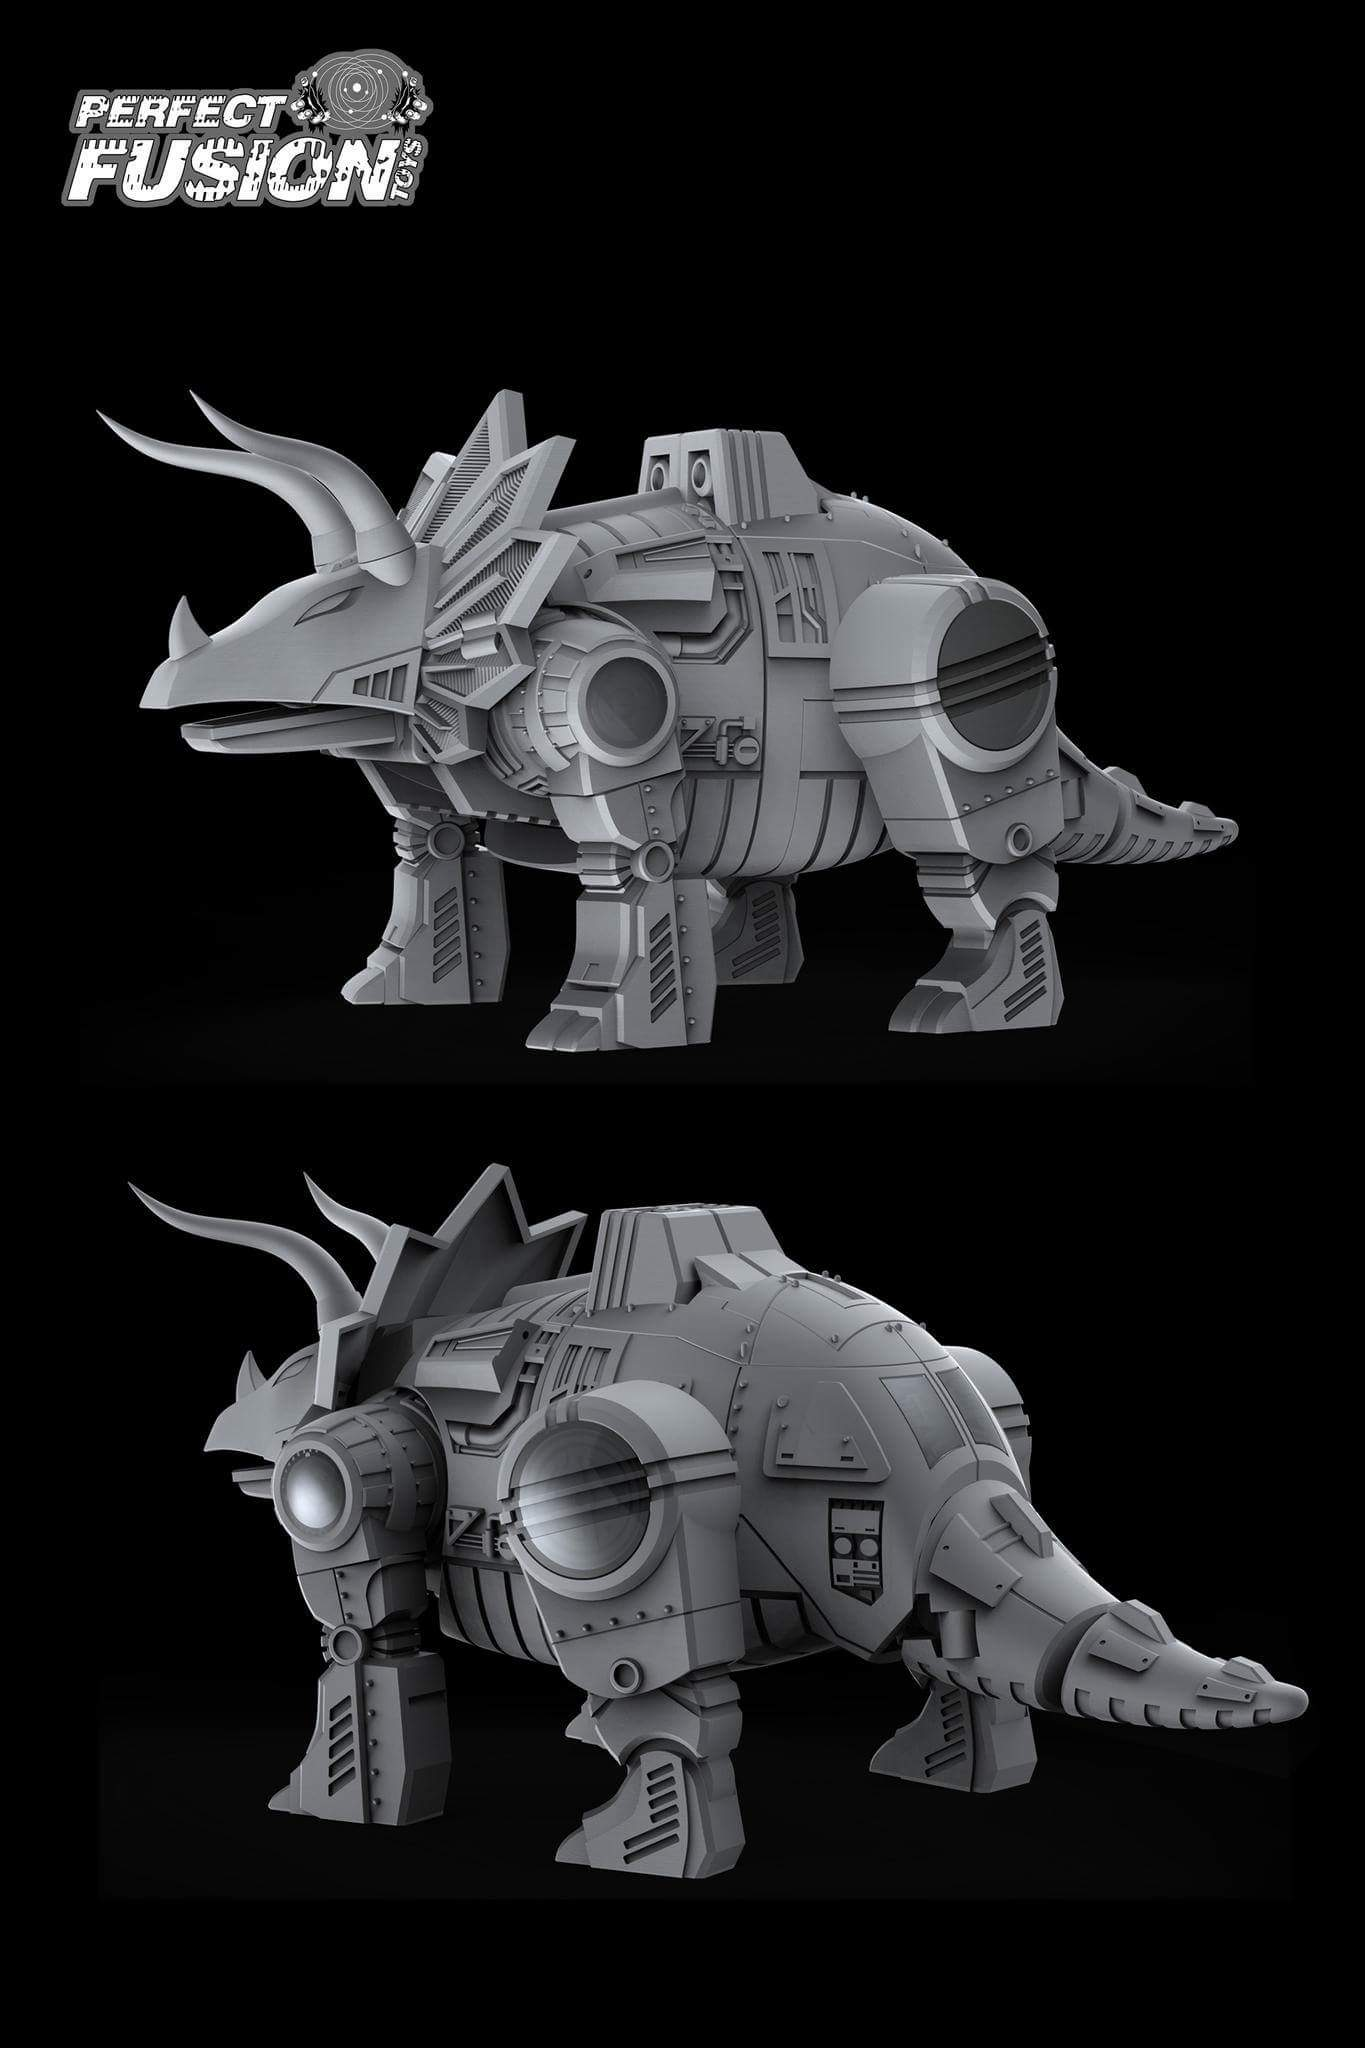 [PerfectFusion] Produit Tiers - Jouet PF-01 Cesium aka Slag/Scories (Dinobots) LJmgJnVo